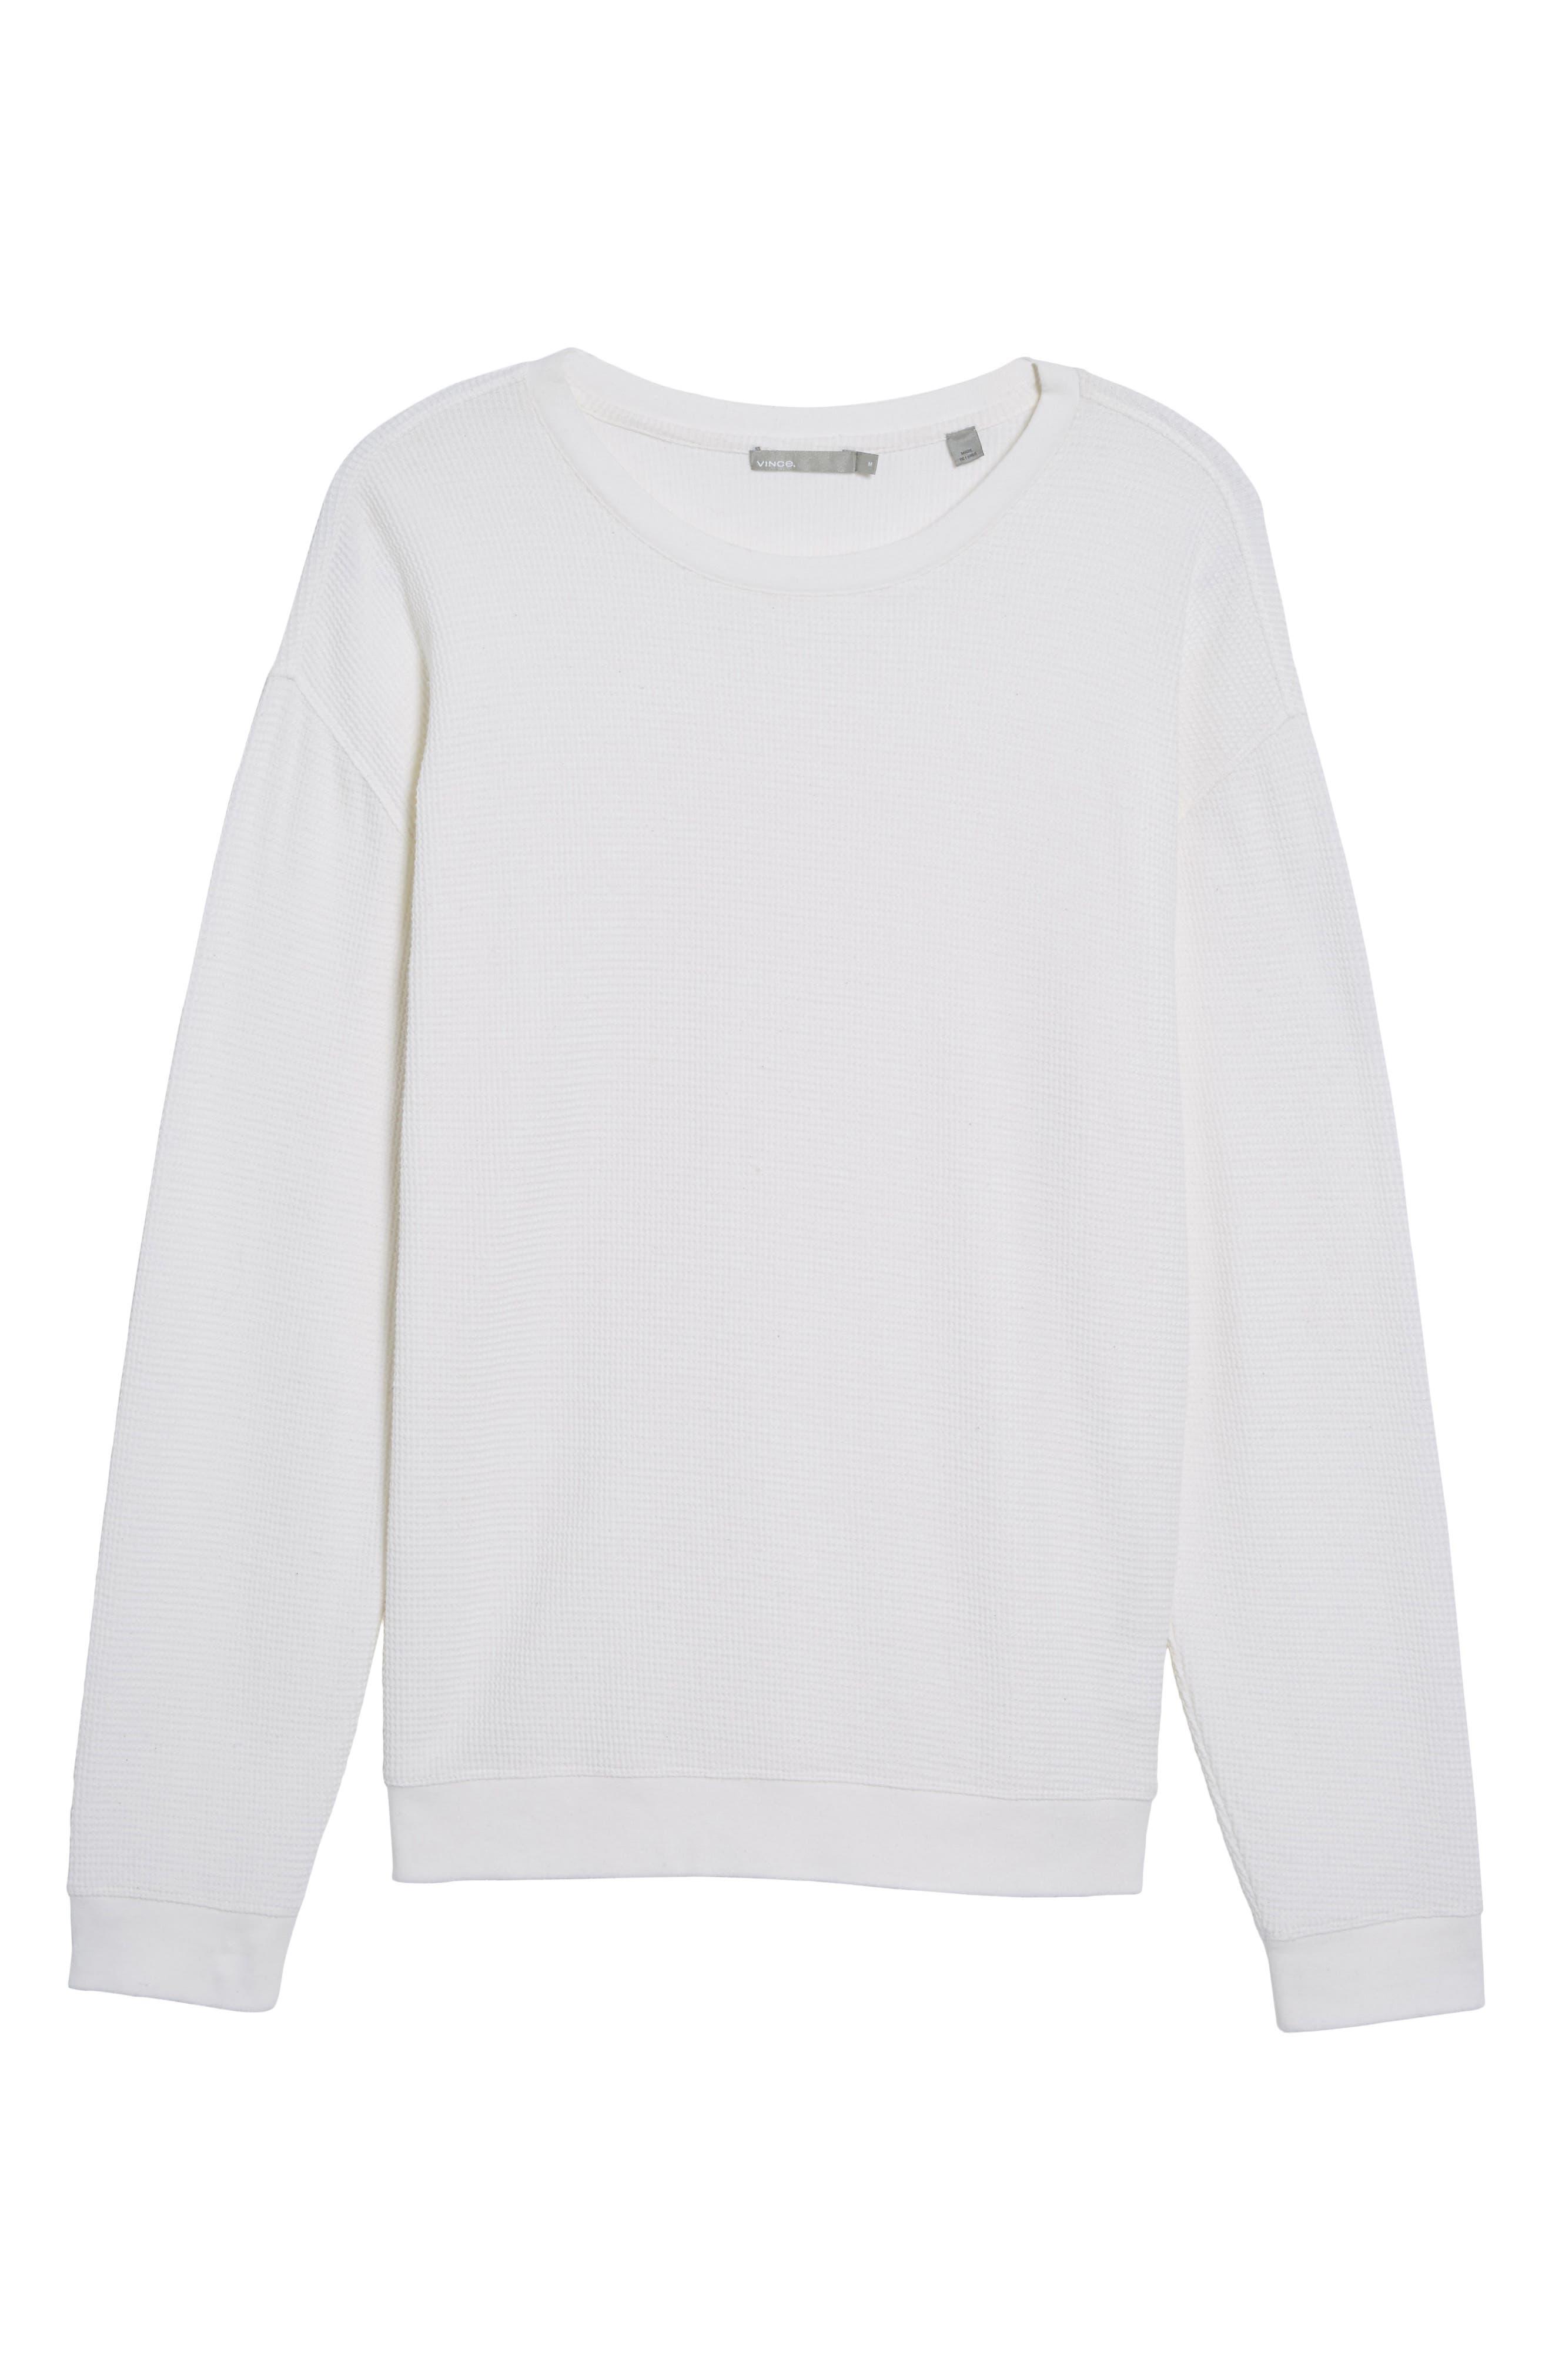 Waffle Knit Sweatshirt,                             Alternate thumbnail 7, color,                             White